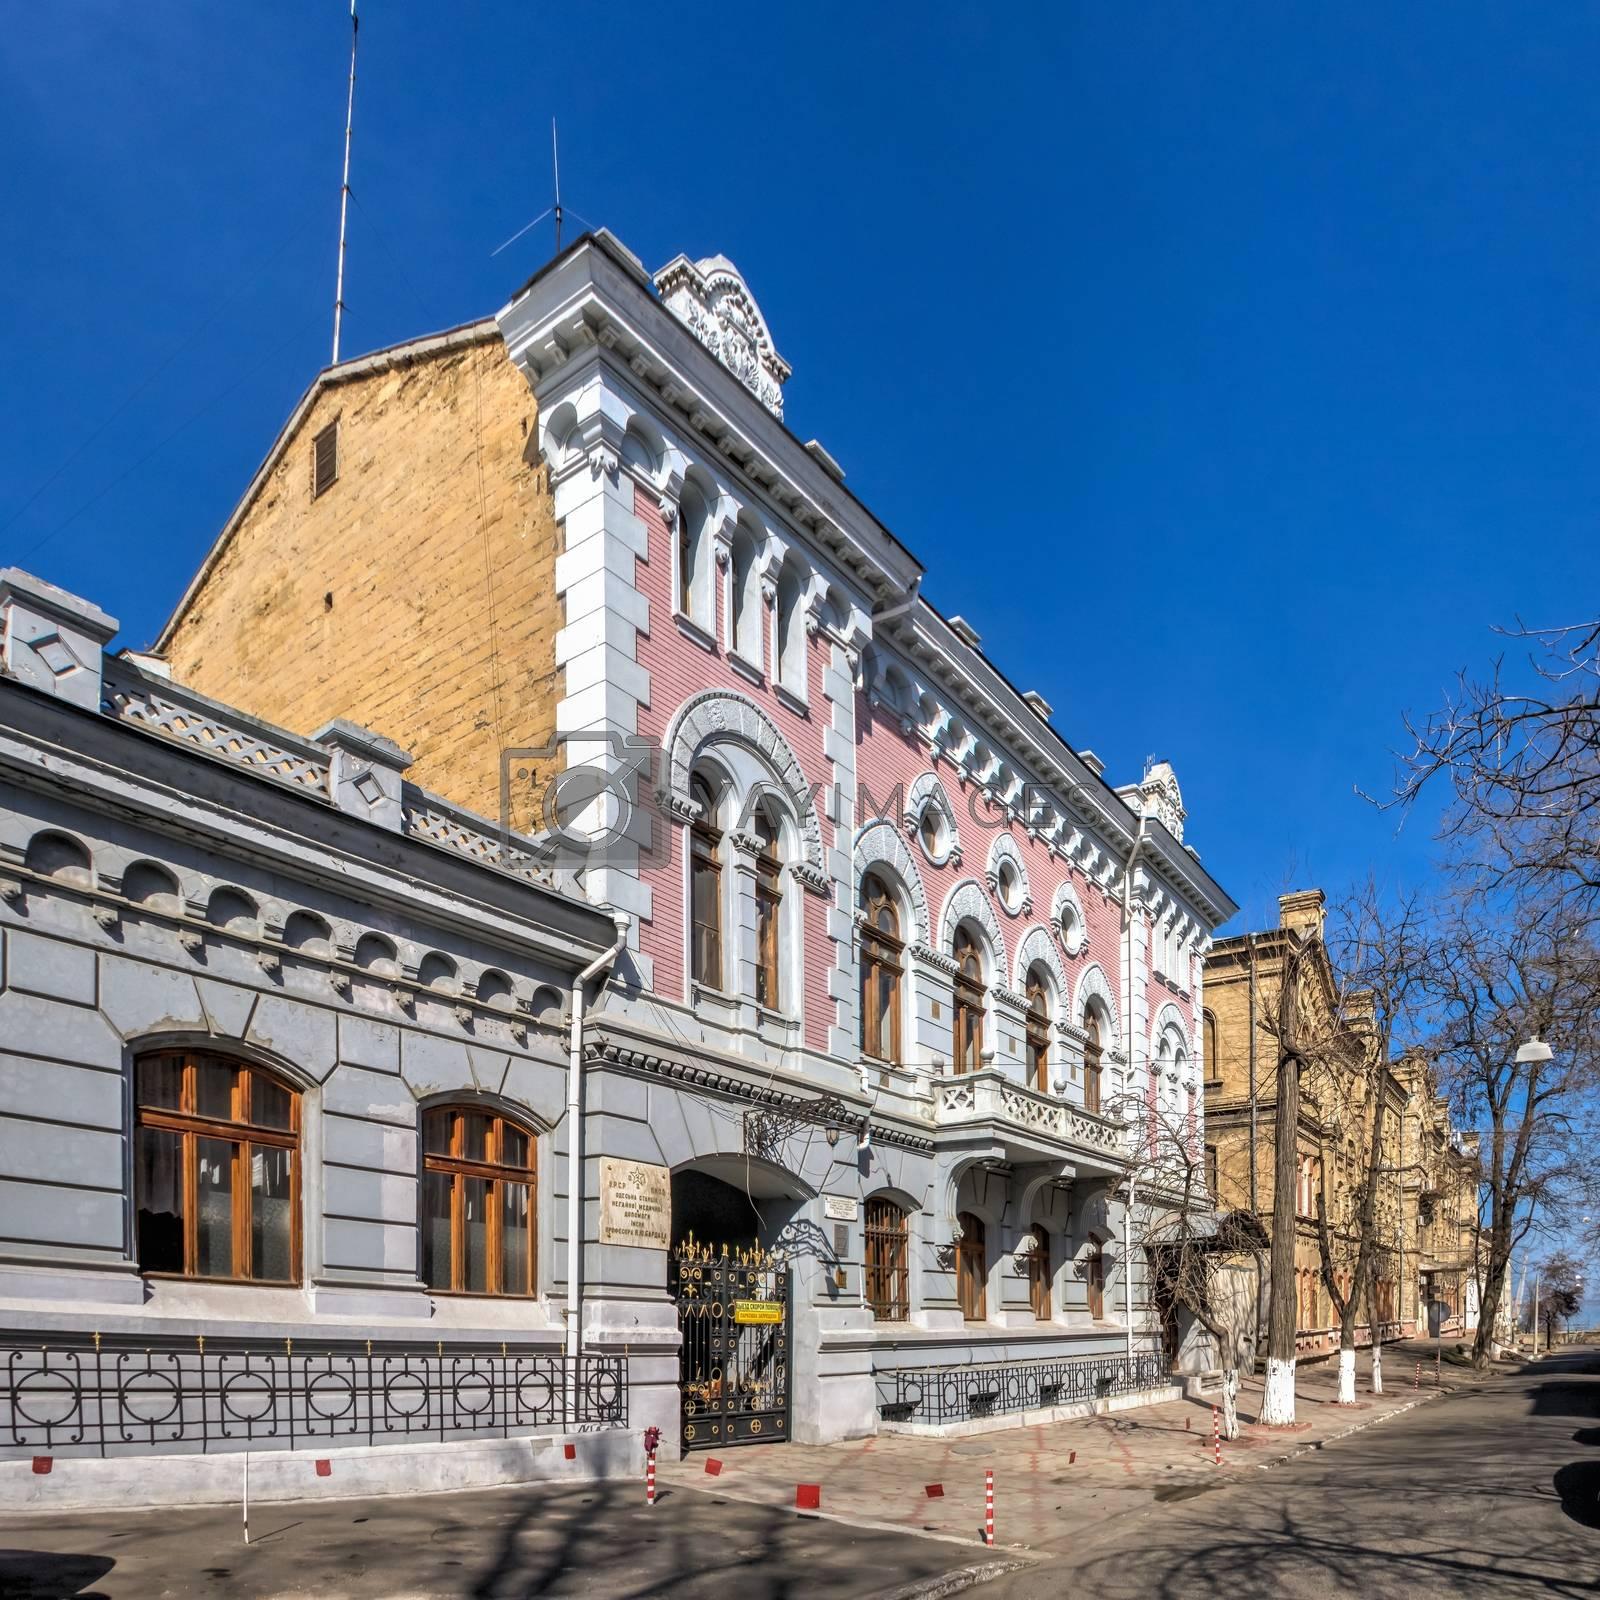 Odessa, Ukraine 03.09.2020. City Ambulance Station in Odessa, Ukraine, on a sunny spring day